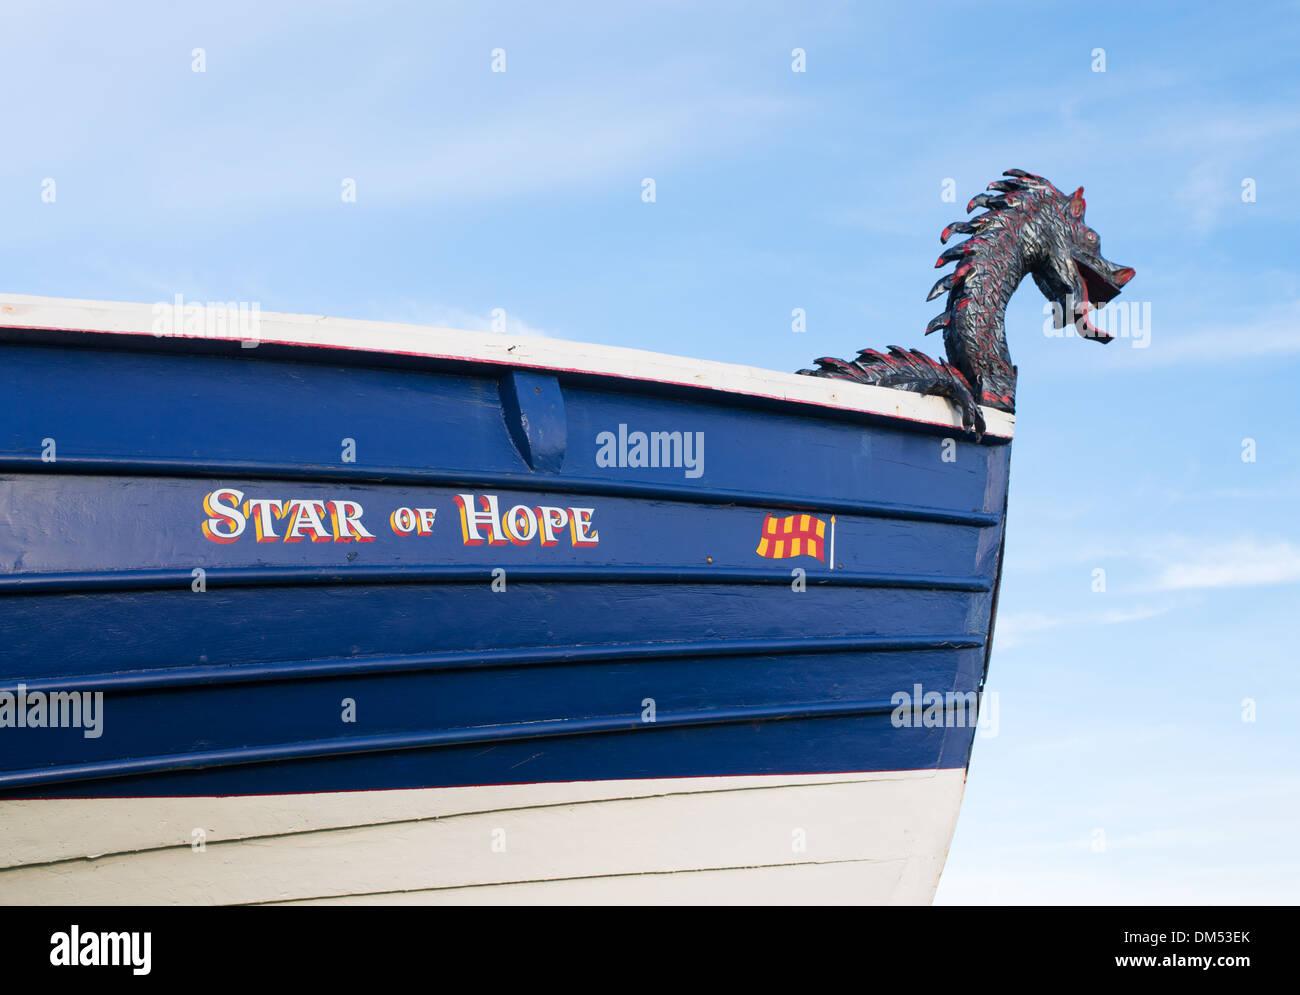 Dragon figurehead on fishing coble Seaton Sluice, north east England UK - Stock Image